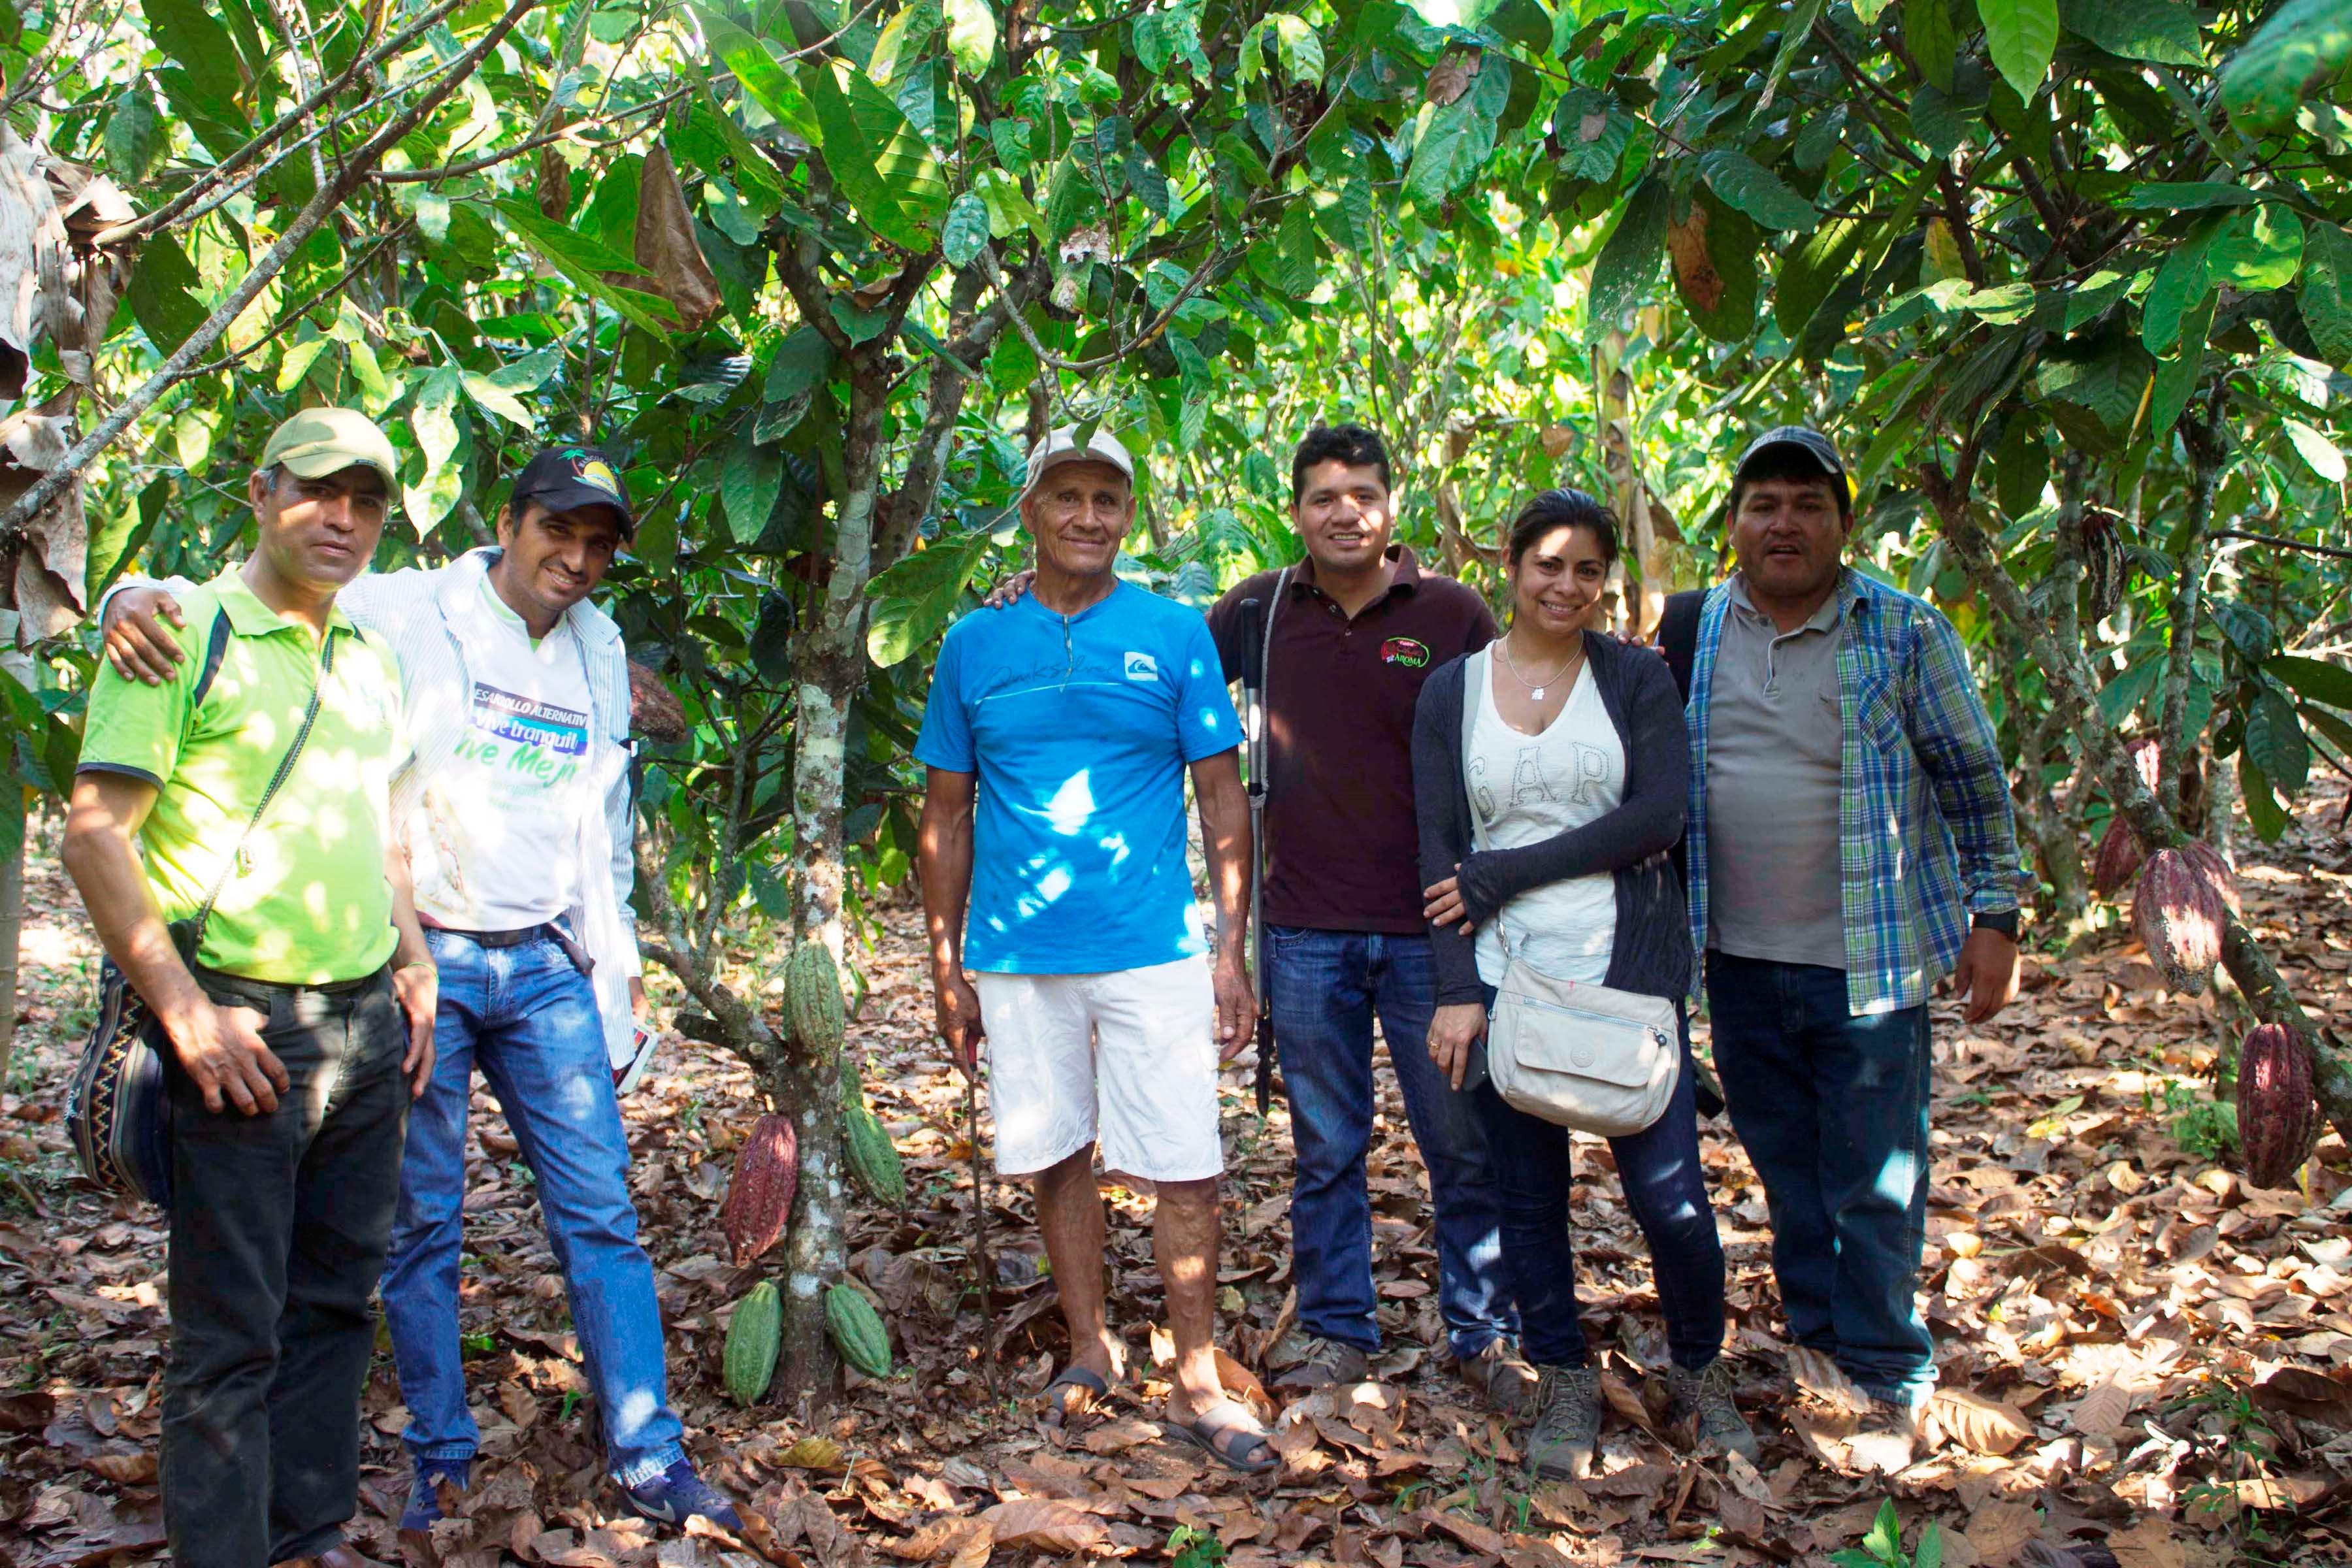 Cacao_Peru_Group.jpg?t=1518195402748&width=633&name=Cacao_Peru_Group.jpg